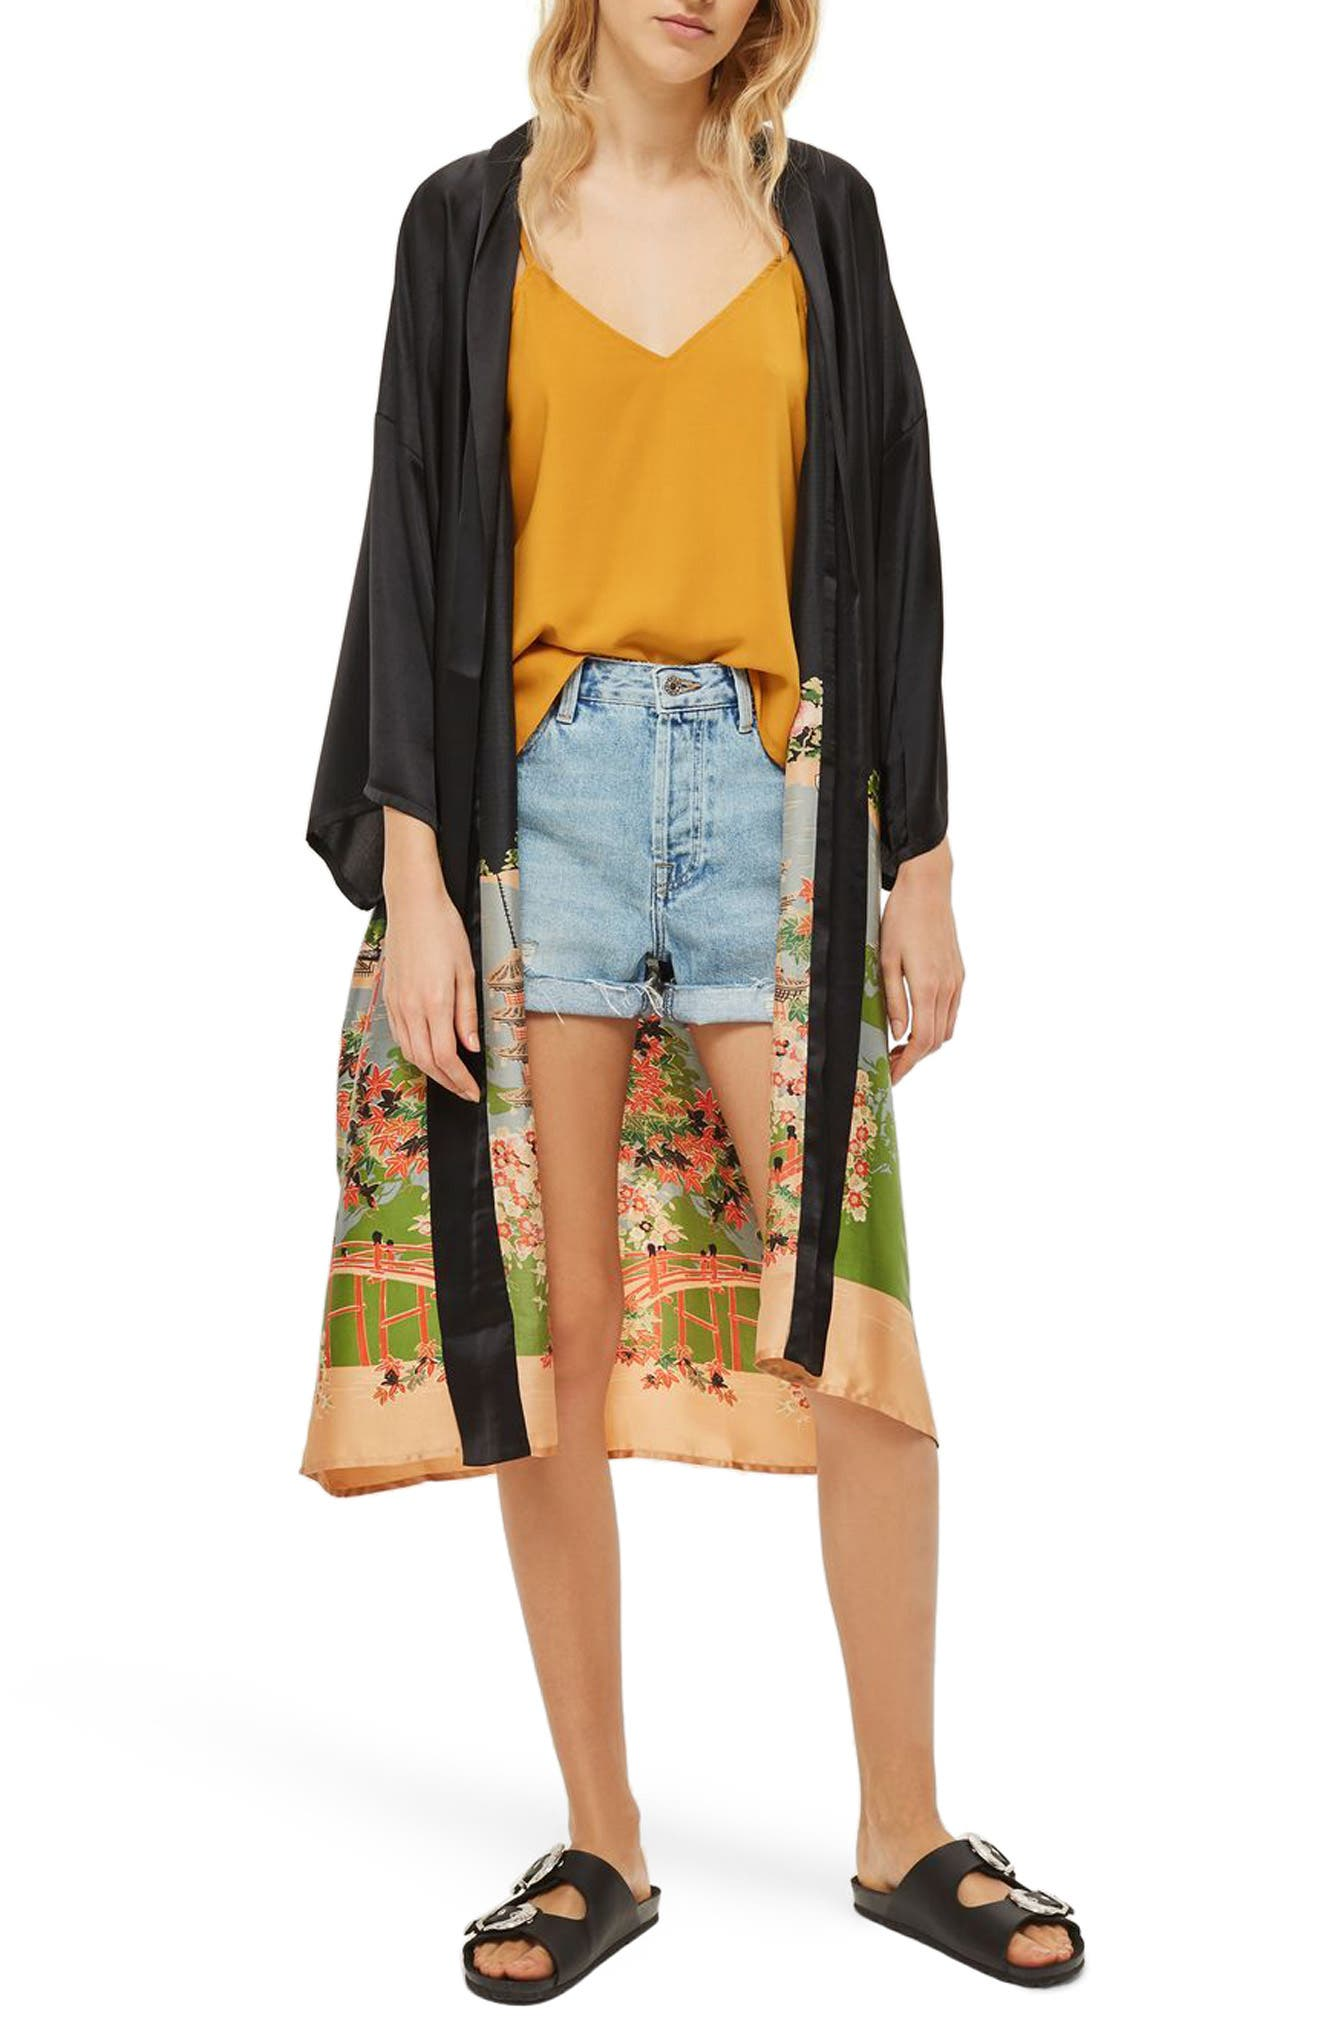 Topshop Graphic Satin Kimono